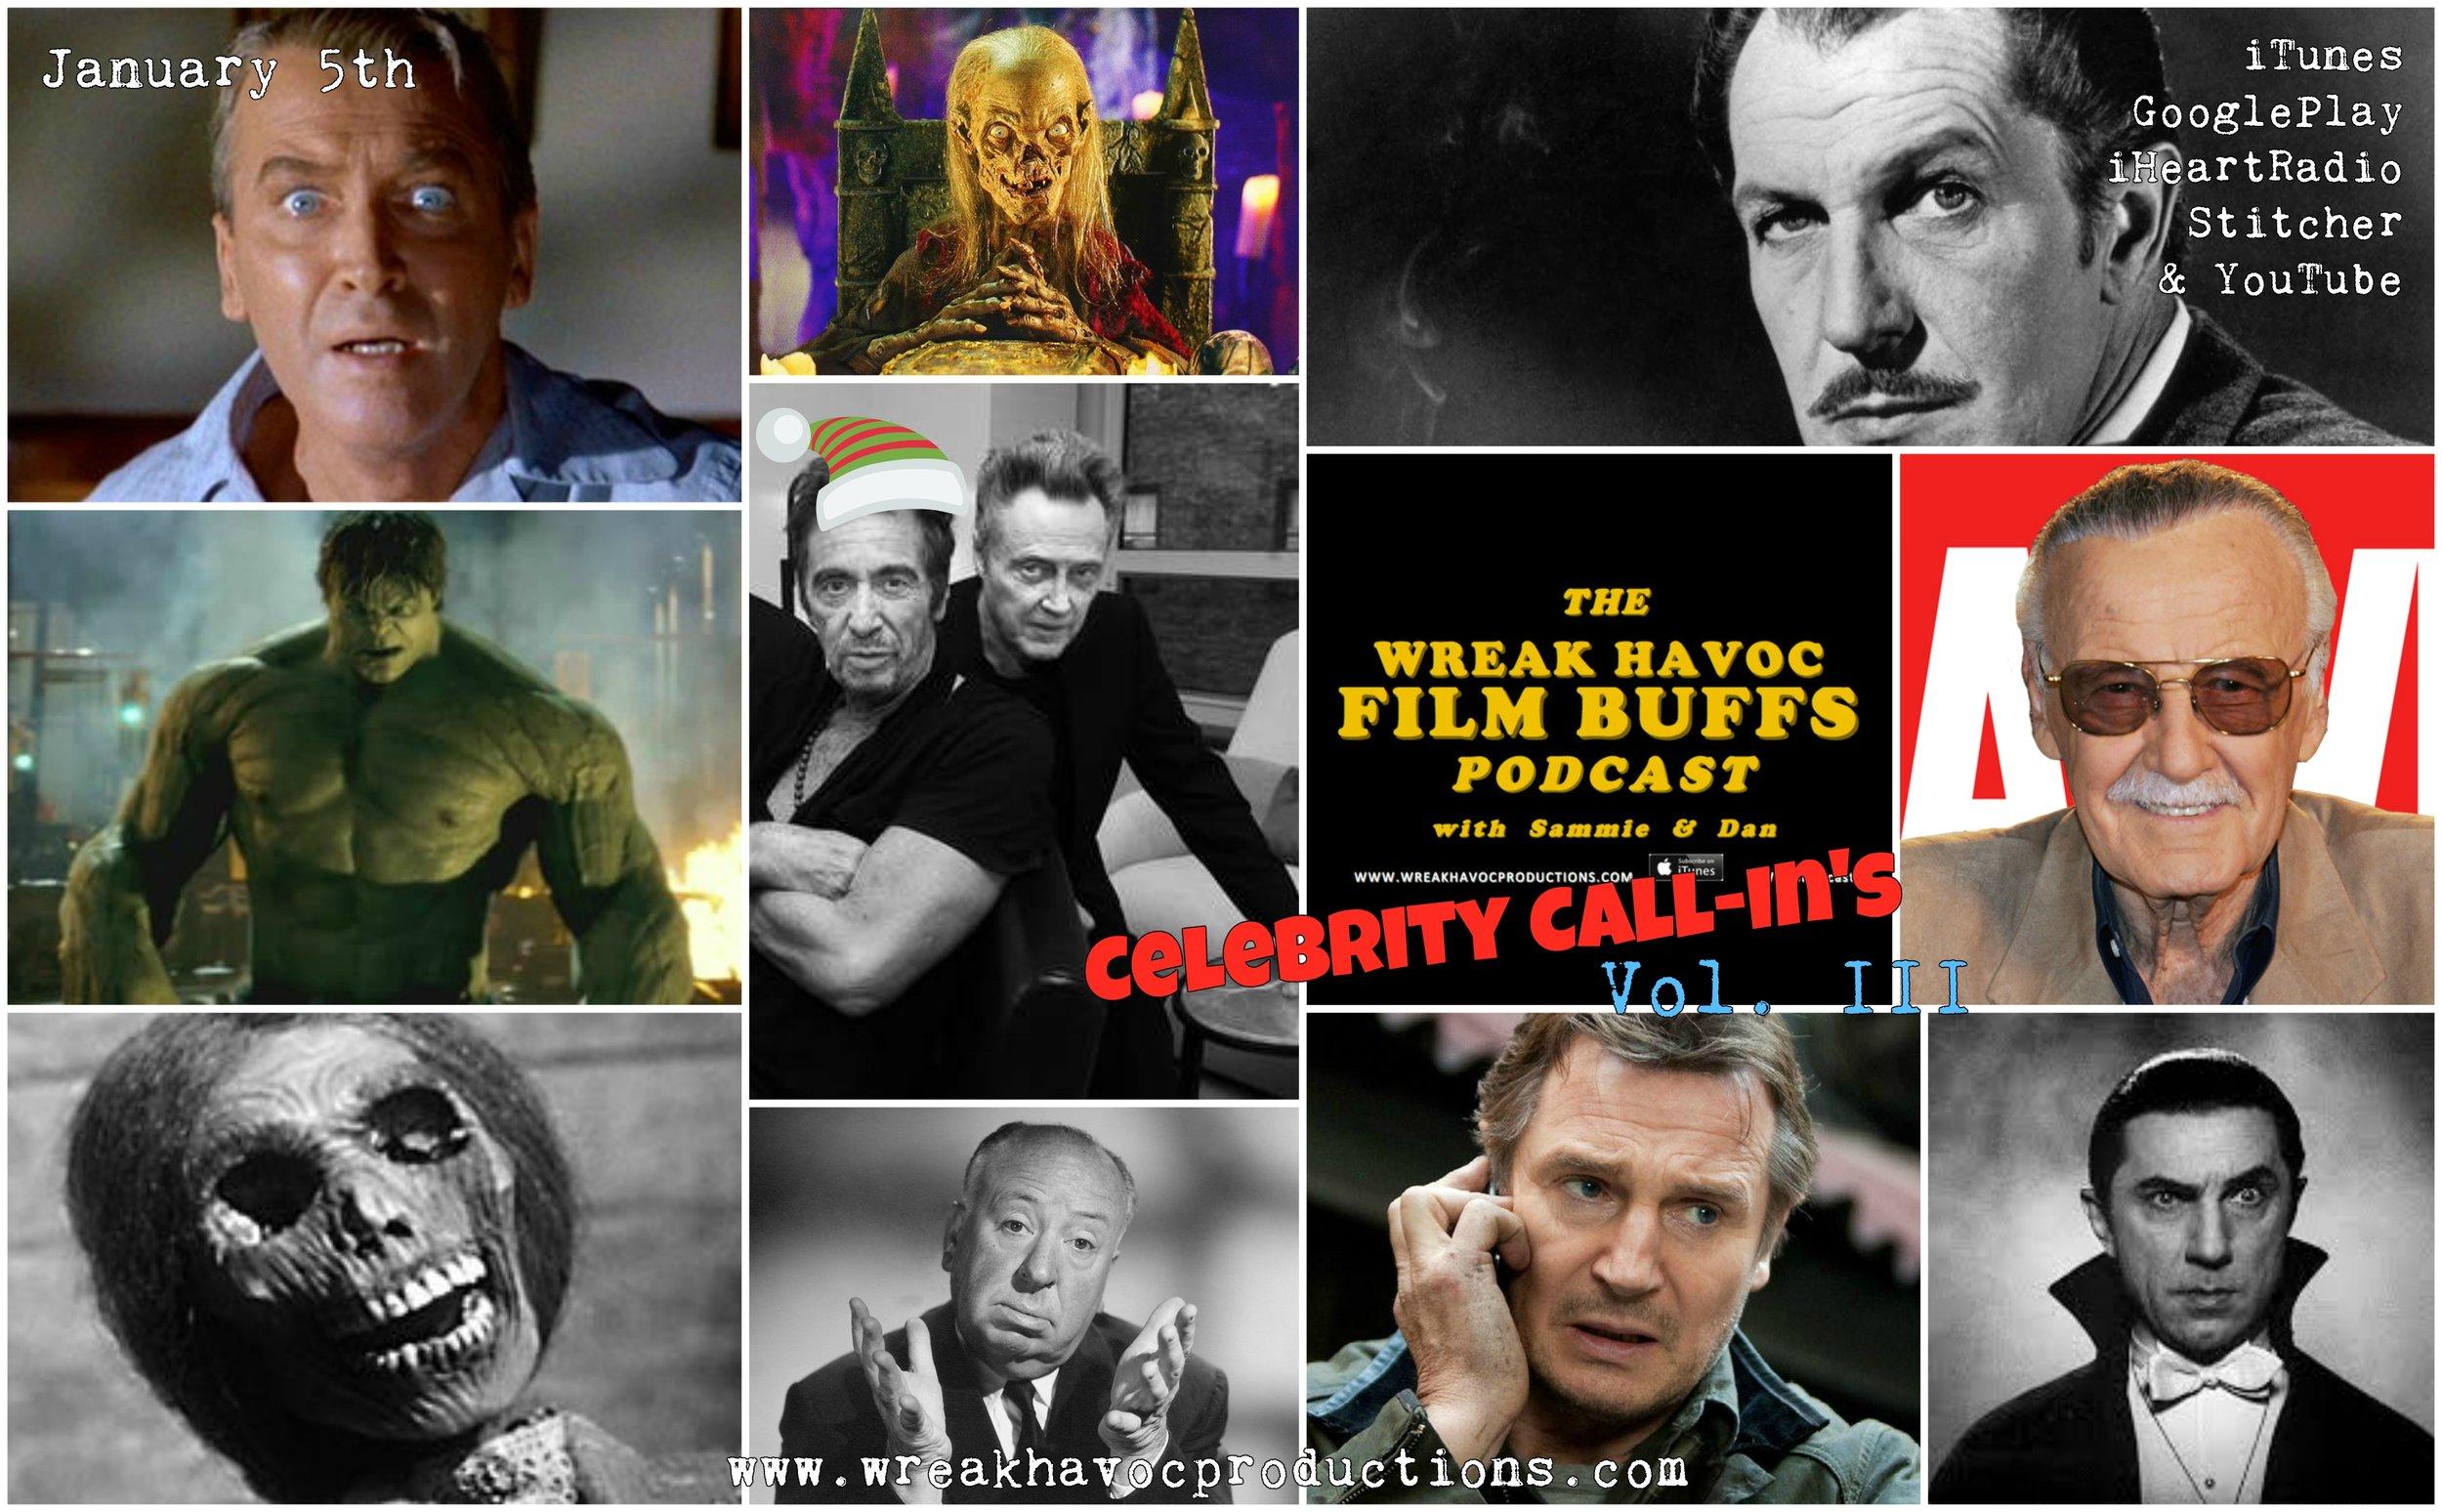 Celebrity Call-Ins Vol 3.jpg